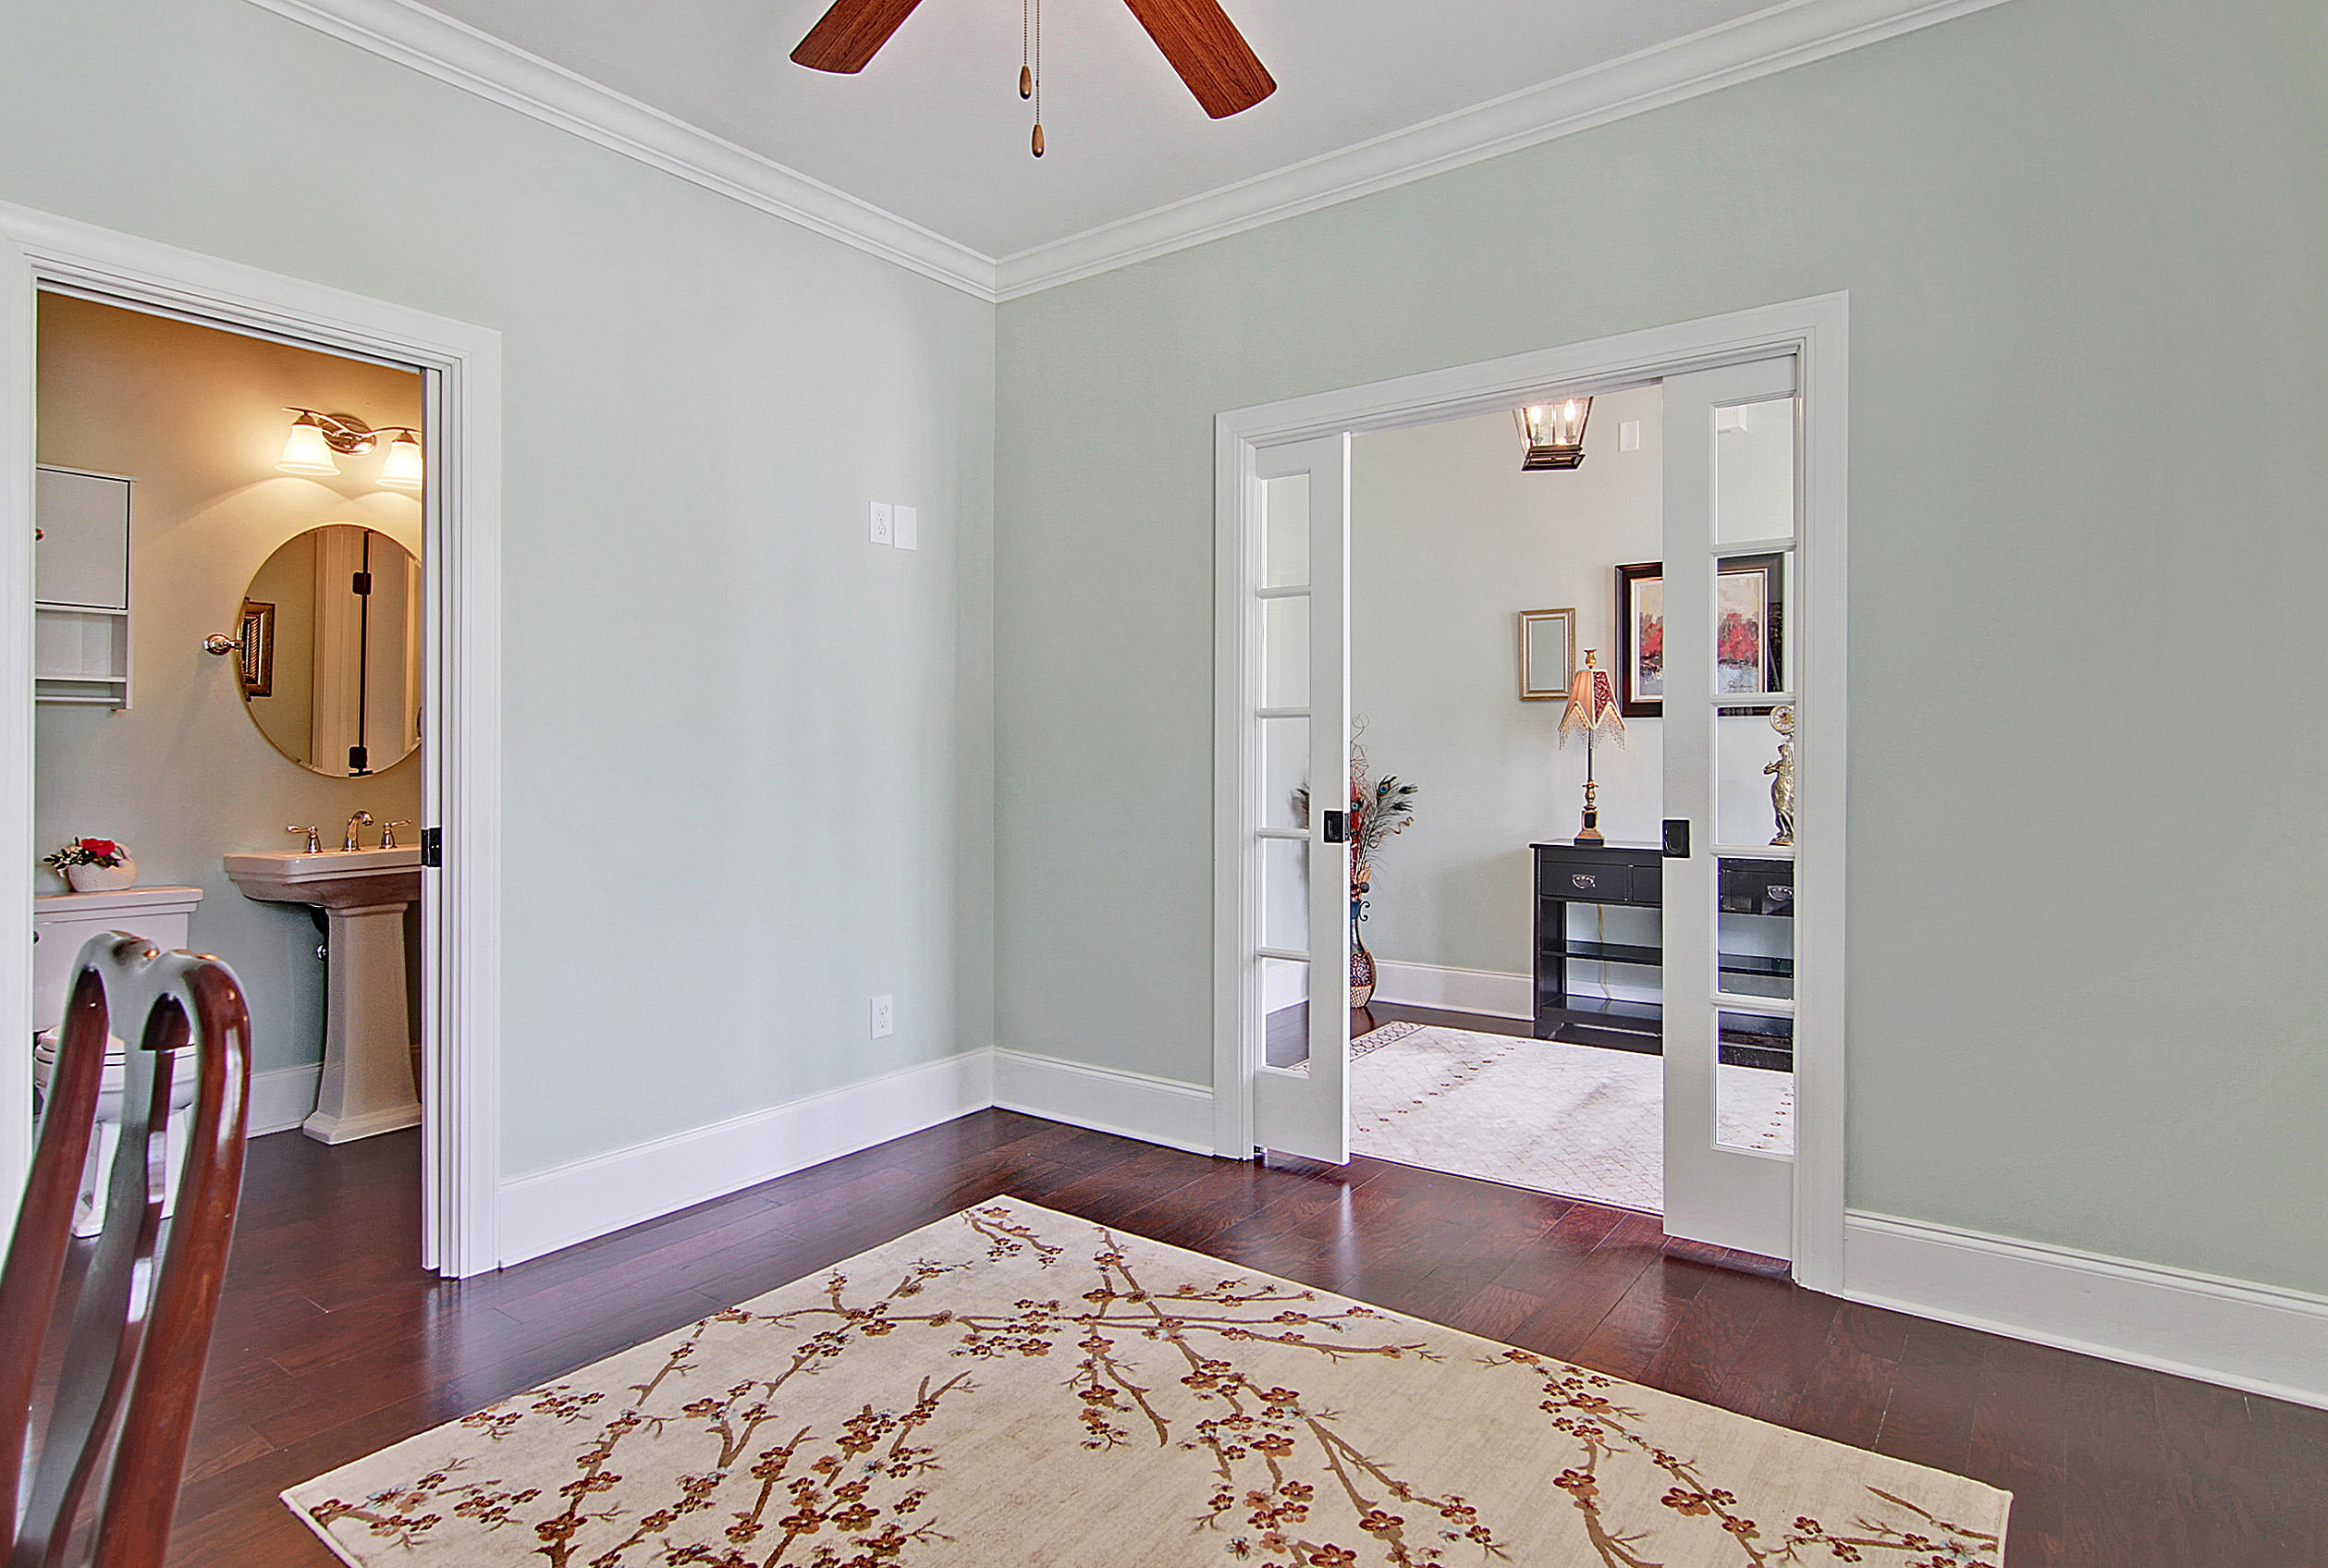 Dunes West Homes For Sale - 1332 Whisker Pole, Mount Pleasant, SC - 24